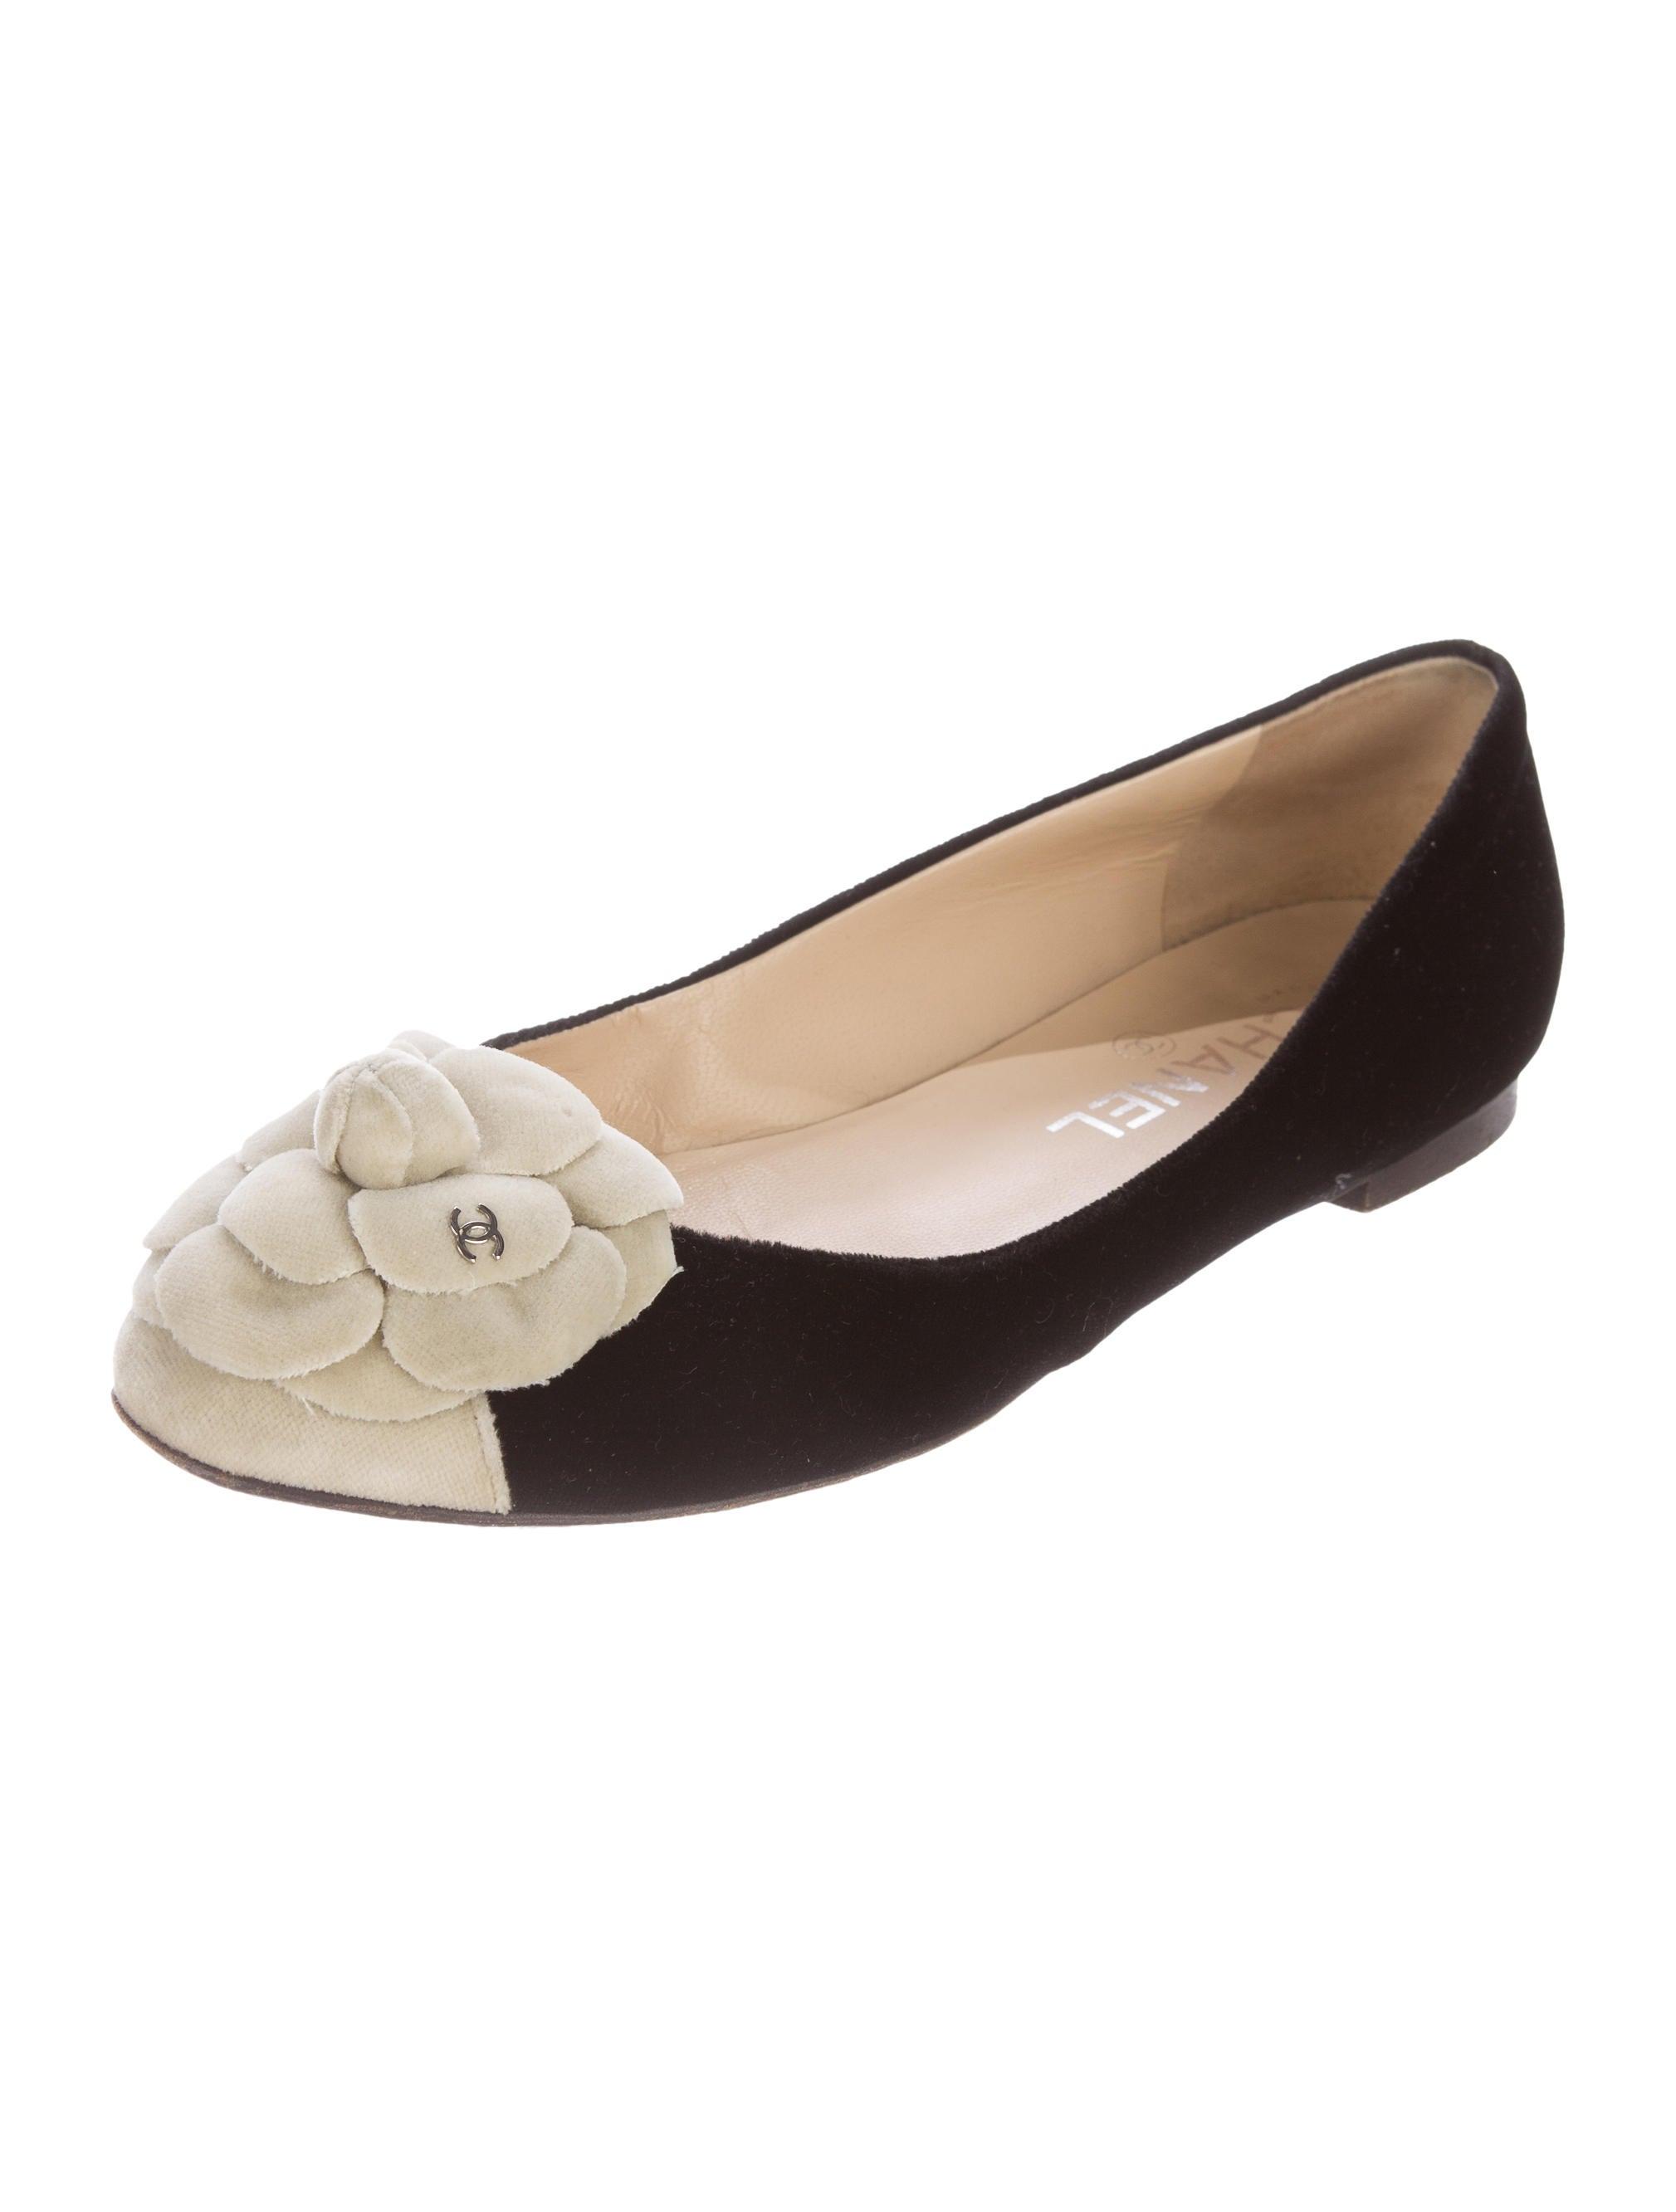 Chanel Velvet Camellia Flats Shoes Cha162998 The